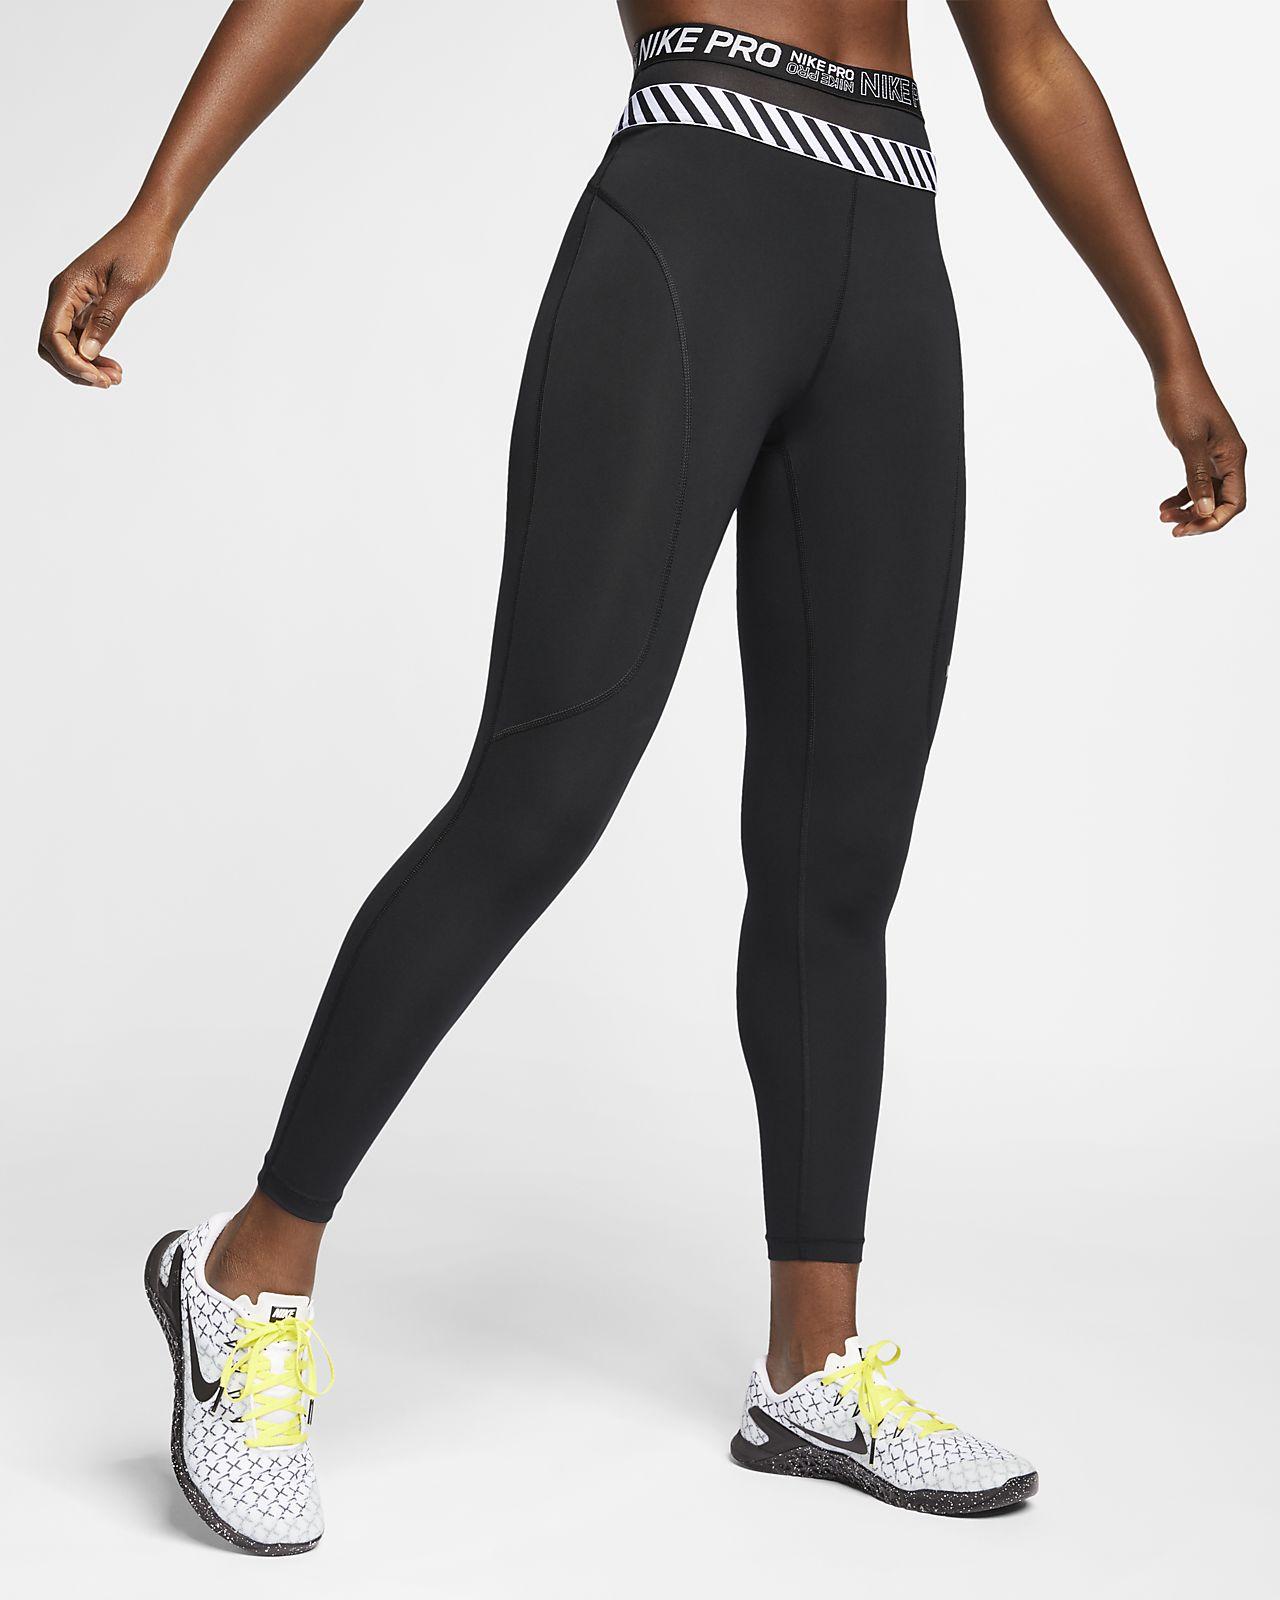 b02a8a67680e83 Nike Pro HyperCool Women's 7/8-Length Tights. Nike.com IE